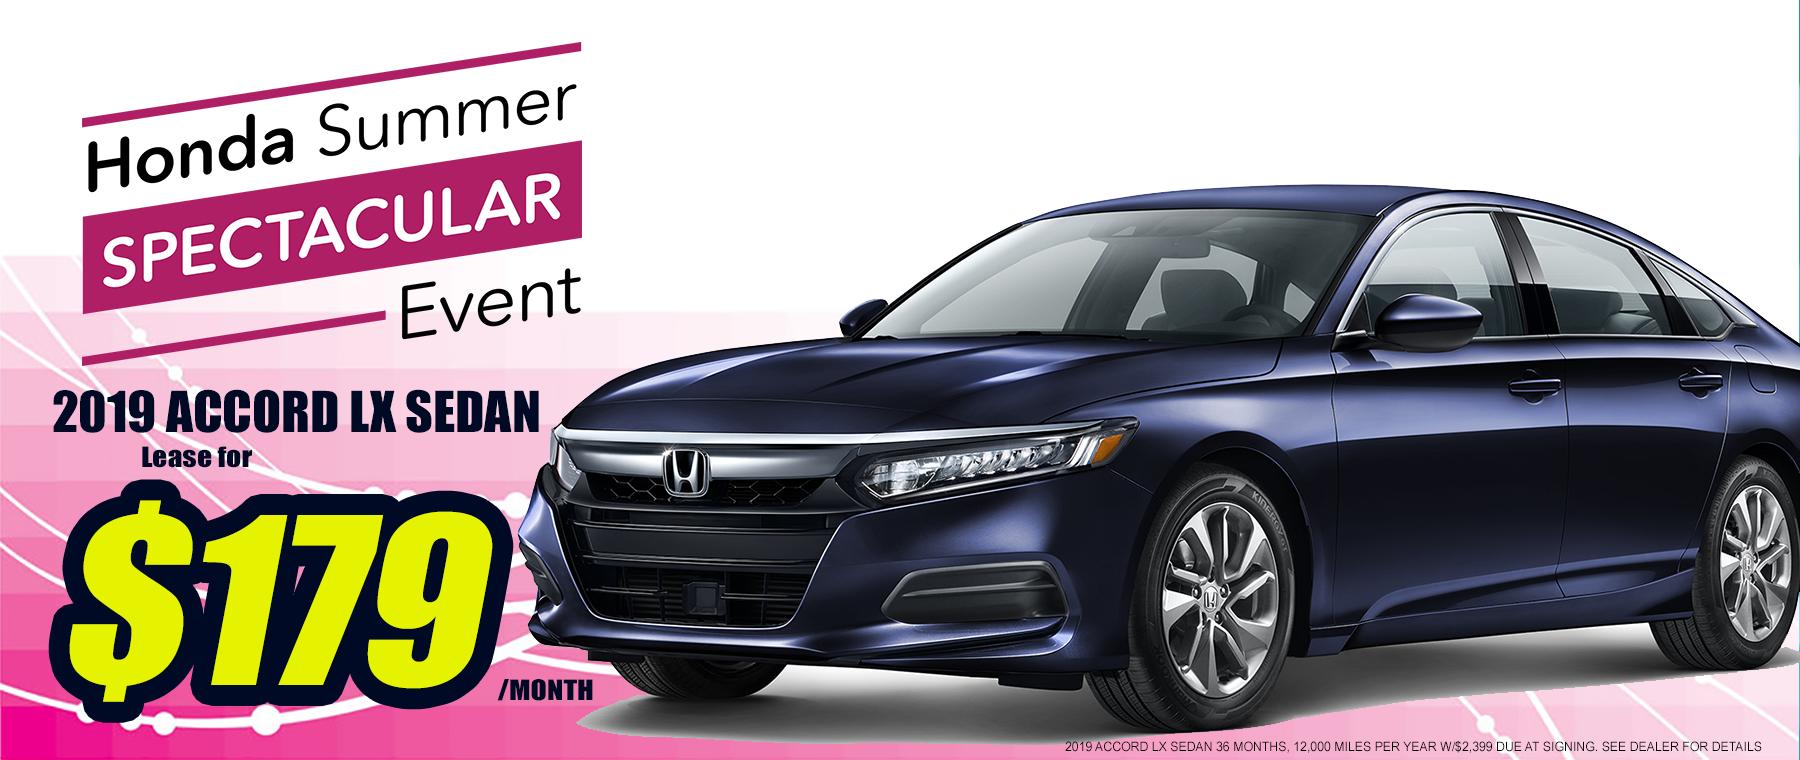 Honda Dealership Orange County >> Honda Dealer In New Britain Serving Middletown Newington And